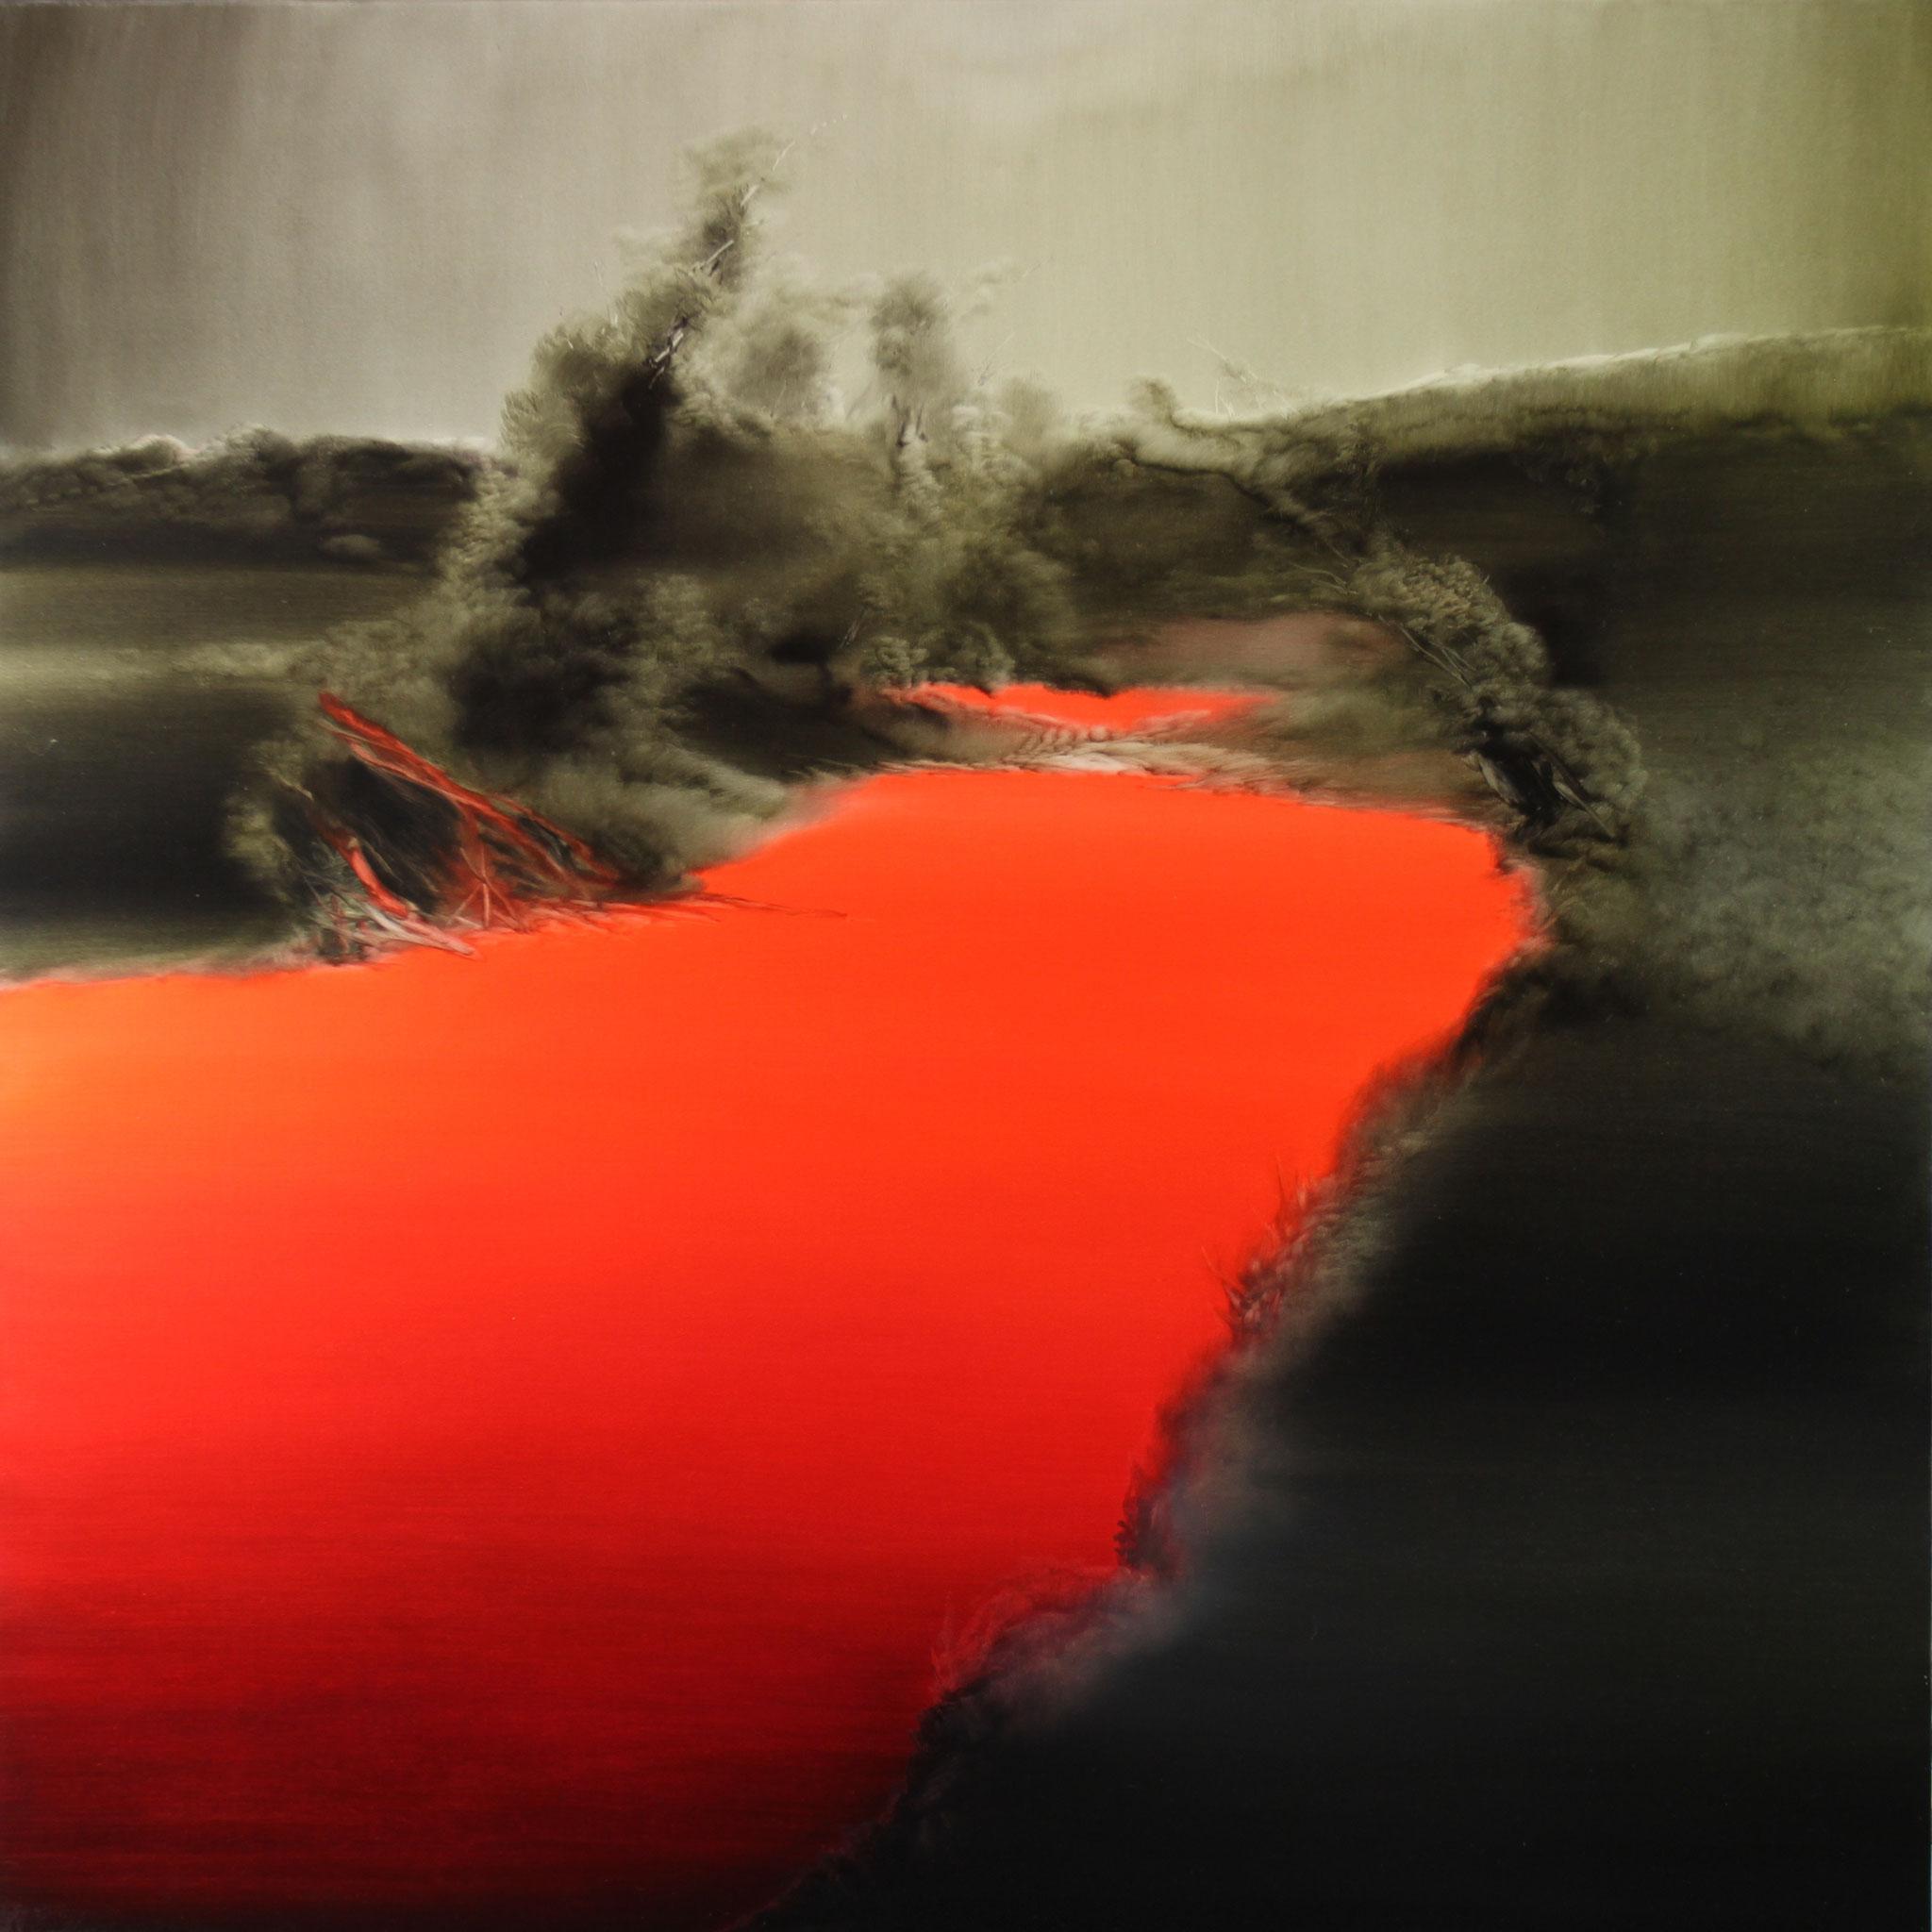 Rot, 2016, Öl auf Leinwand, 190cm x 190cm